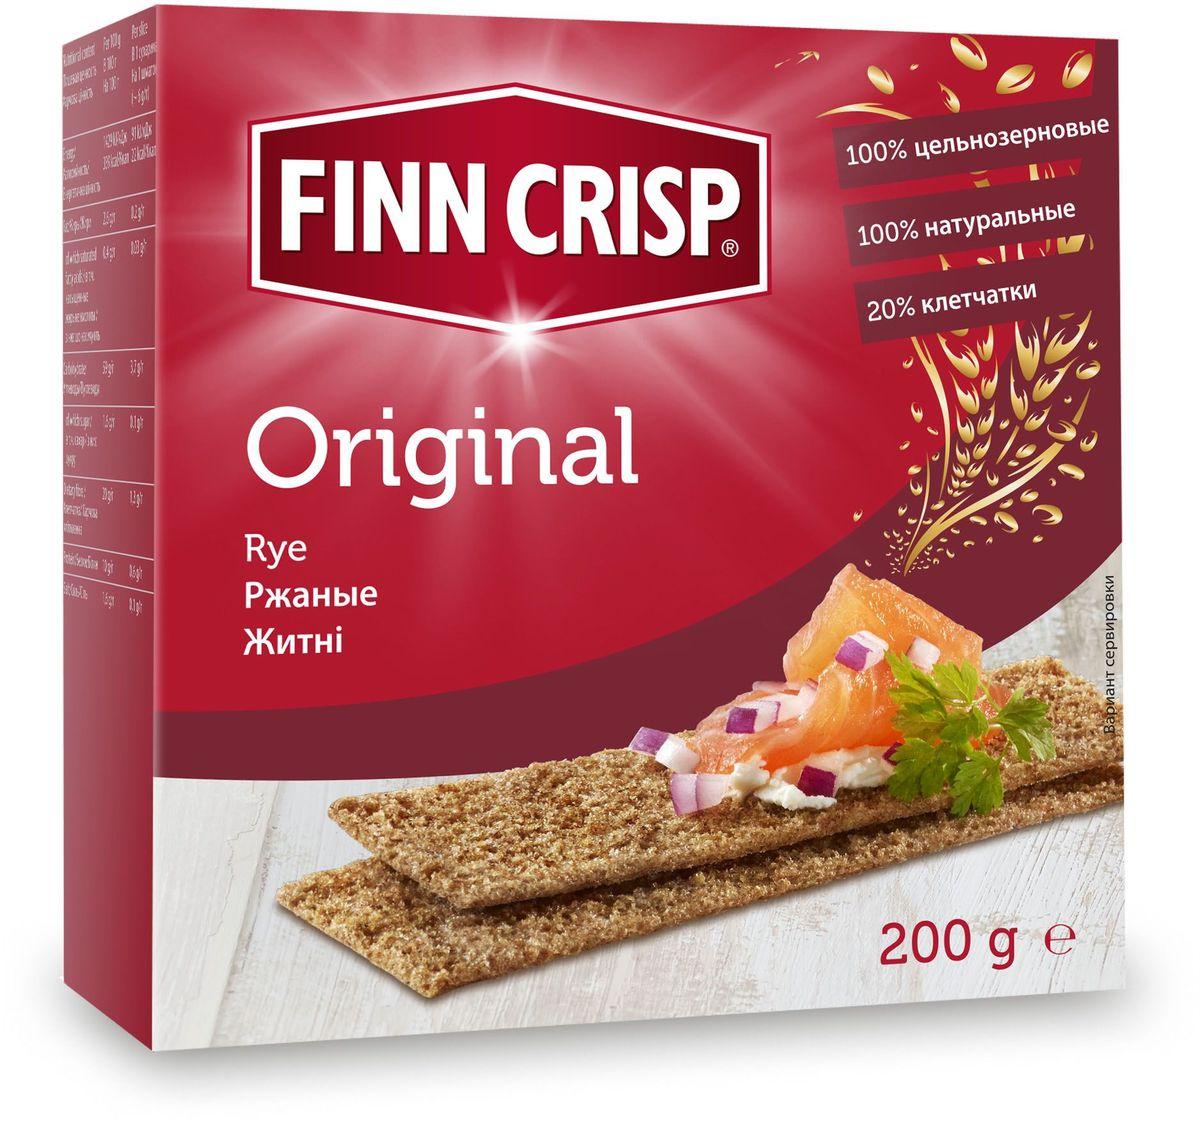 Finn Crisp Original хлебцы ржаные, 200 г20213